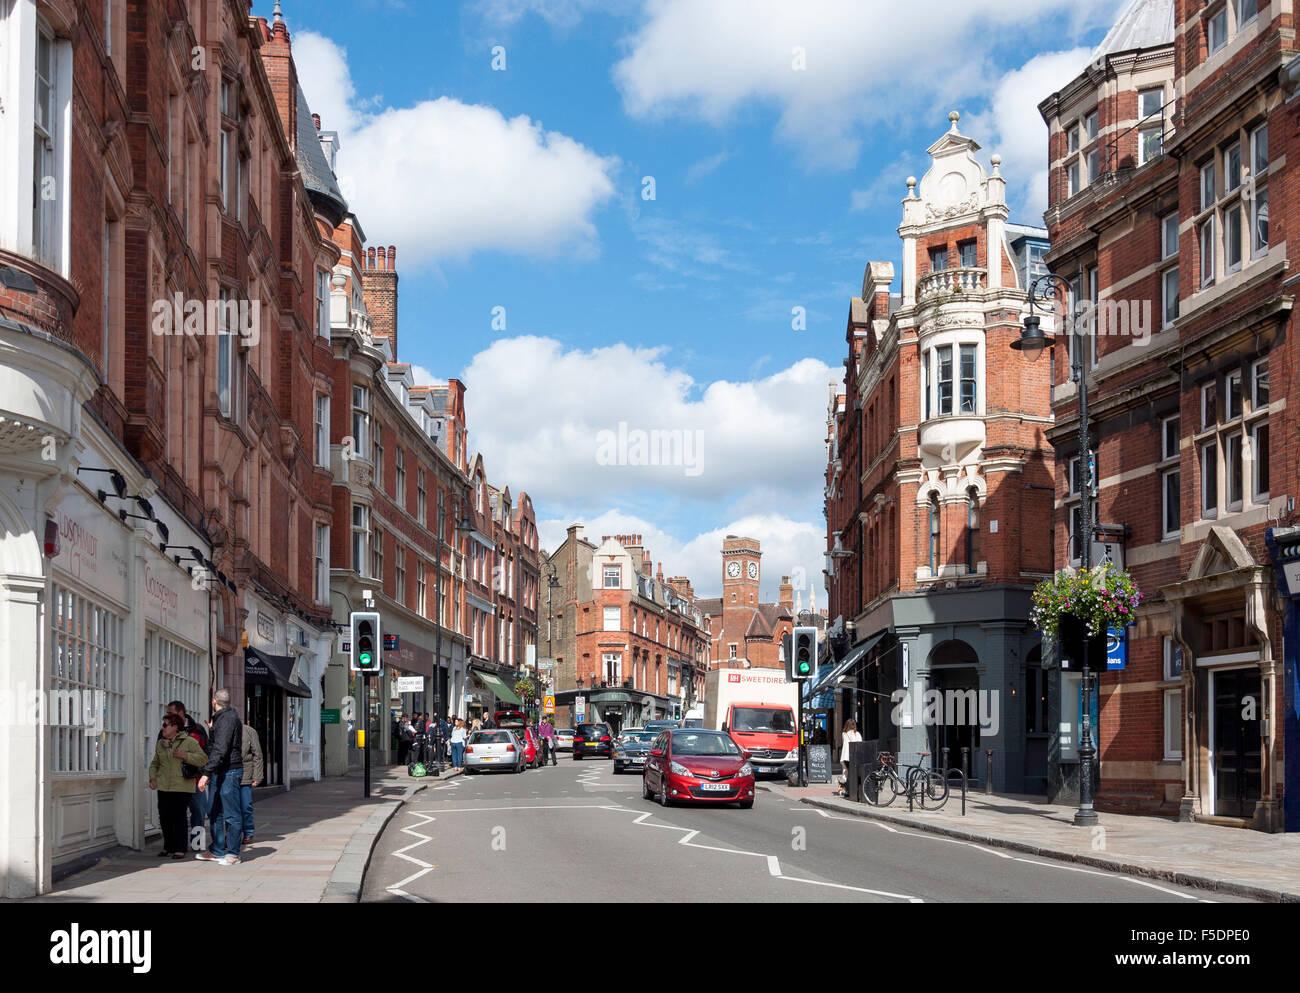 Heath Street, Hampstead, London Borough of Camden, Greater London, England, United Kingdom - Stock Image